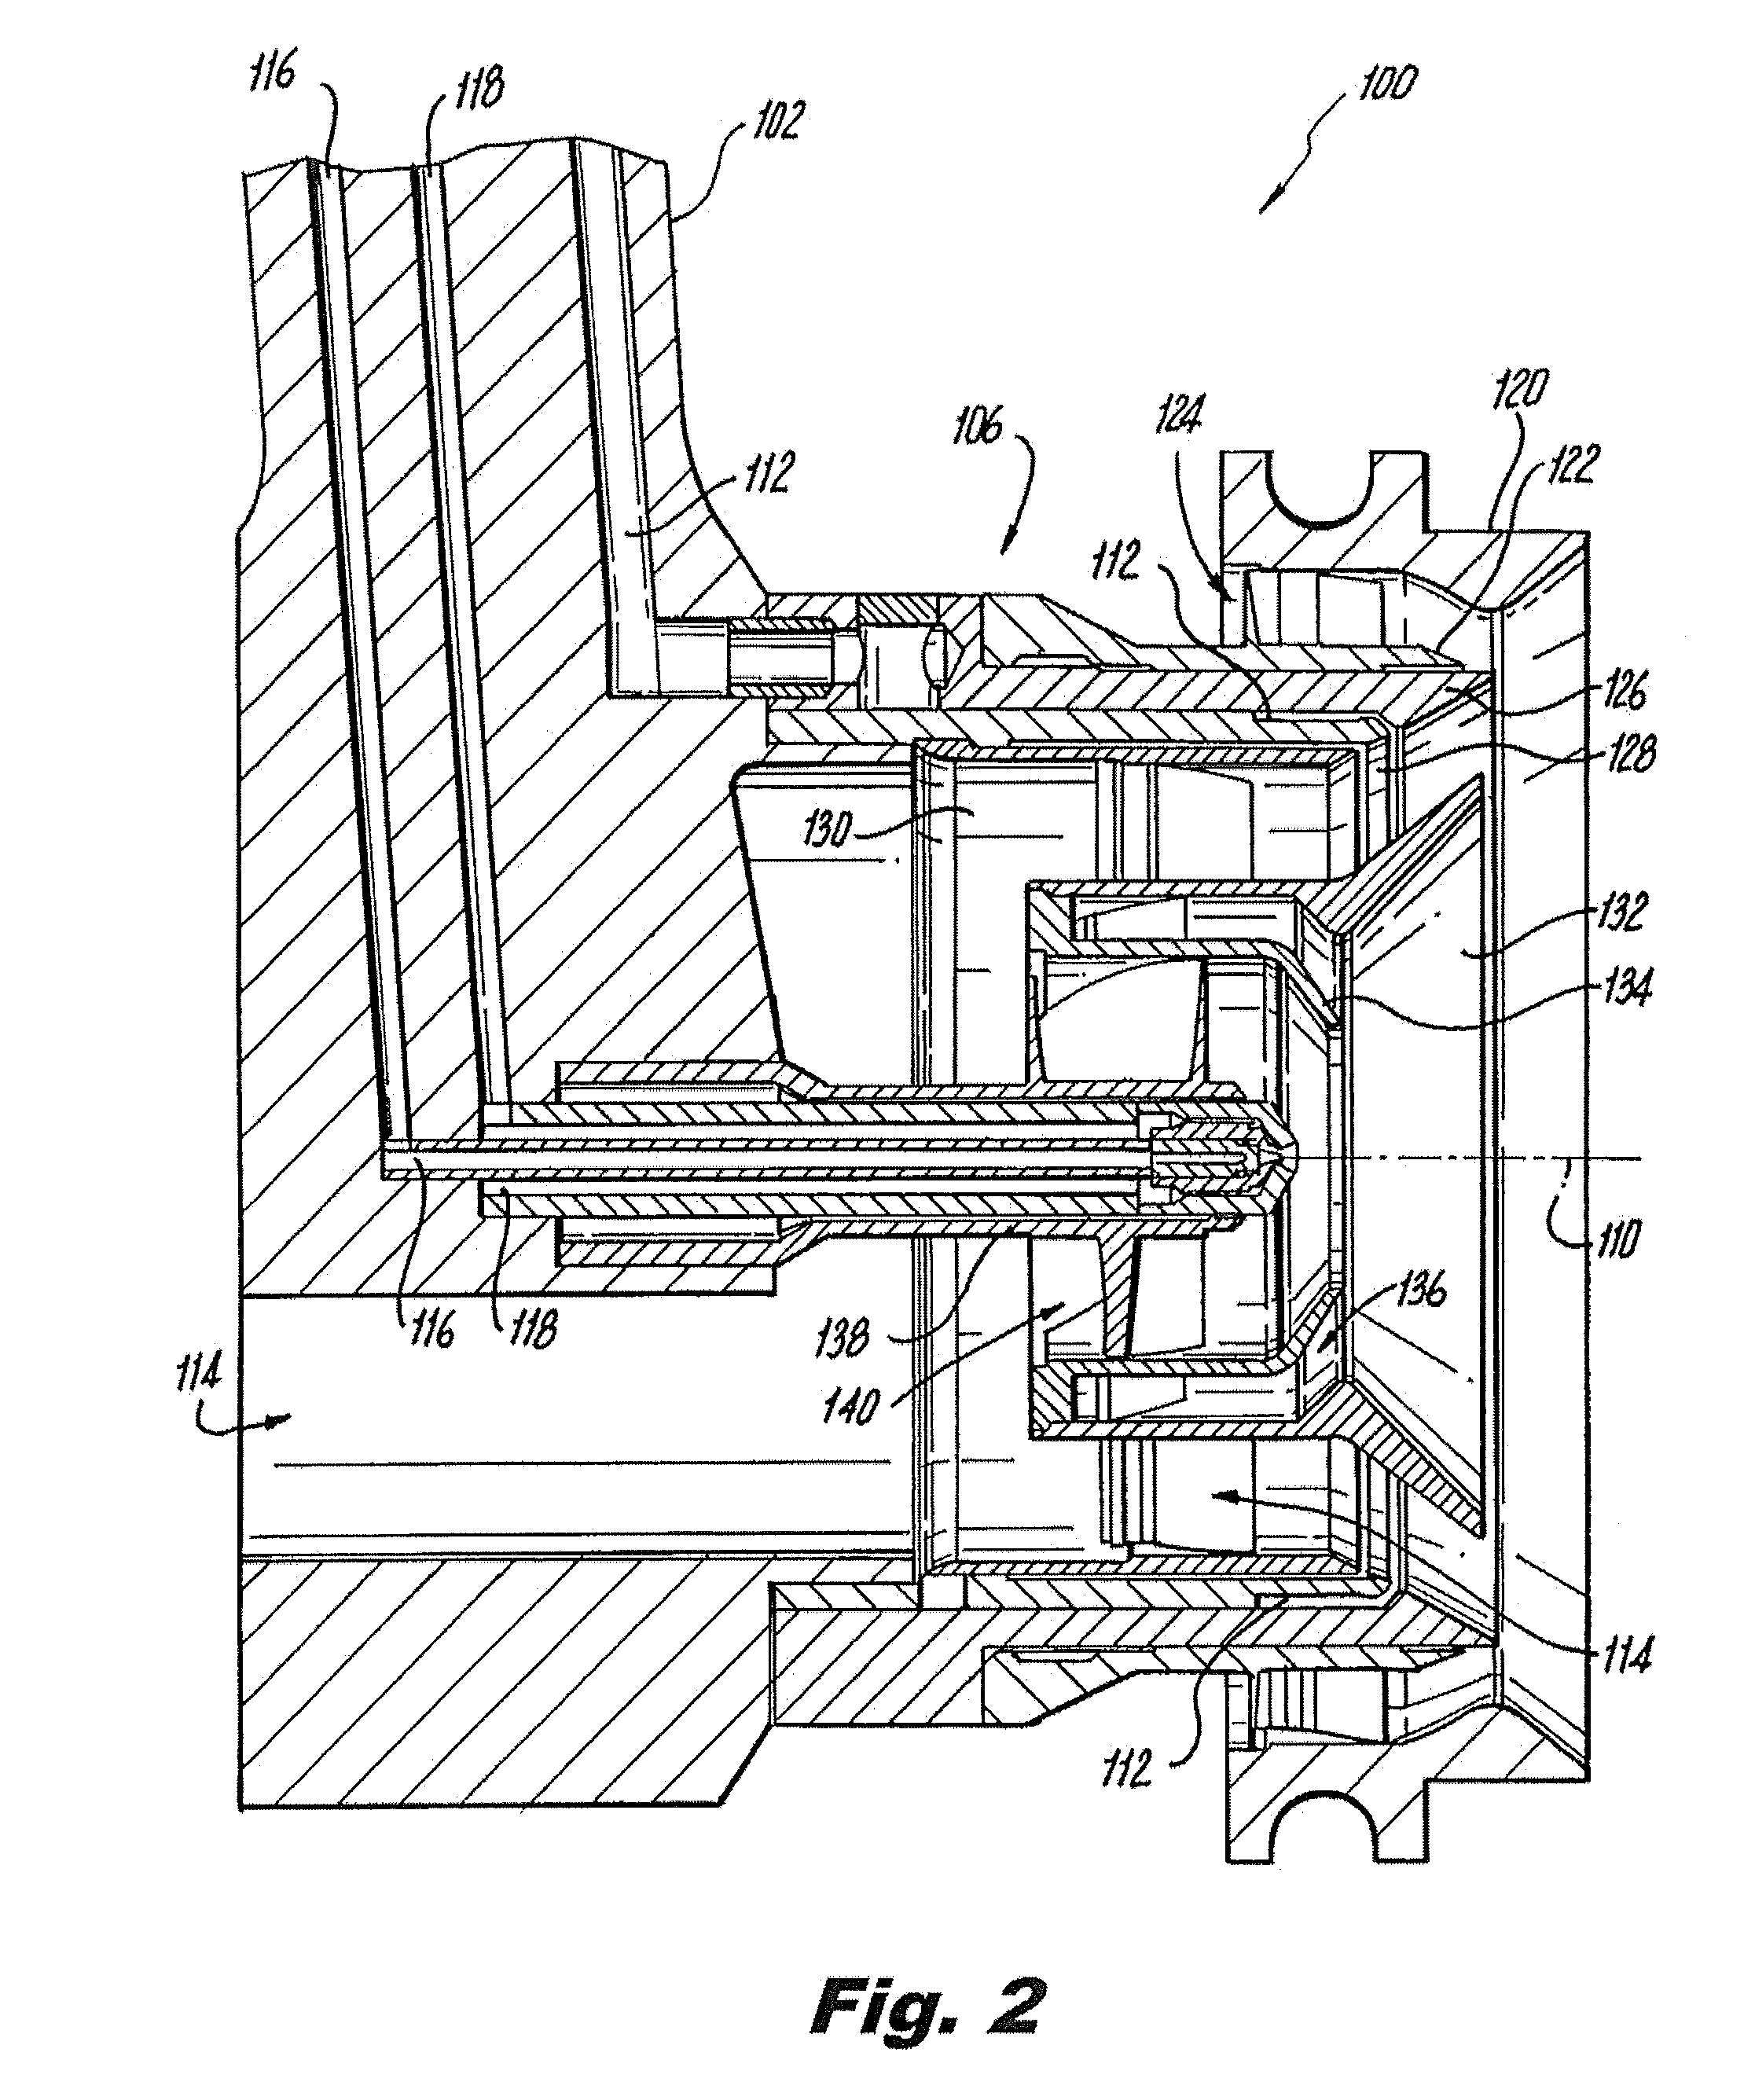 Patent US Lean burn injectors having a main fuel circuit